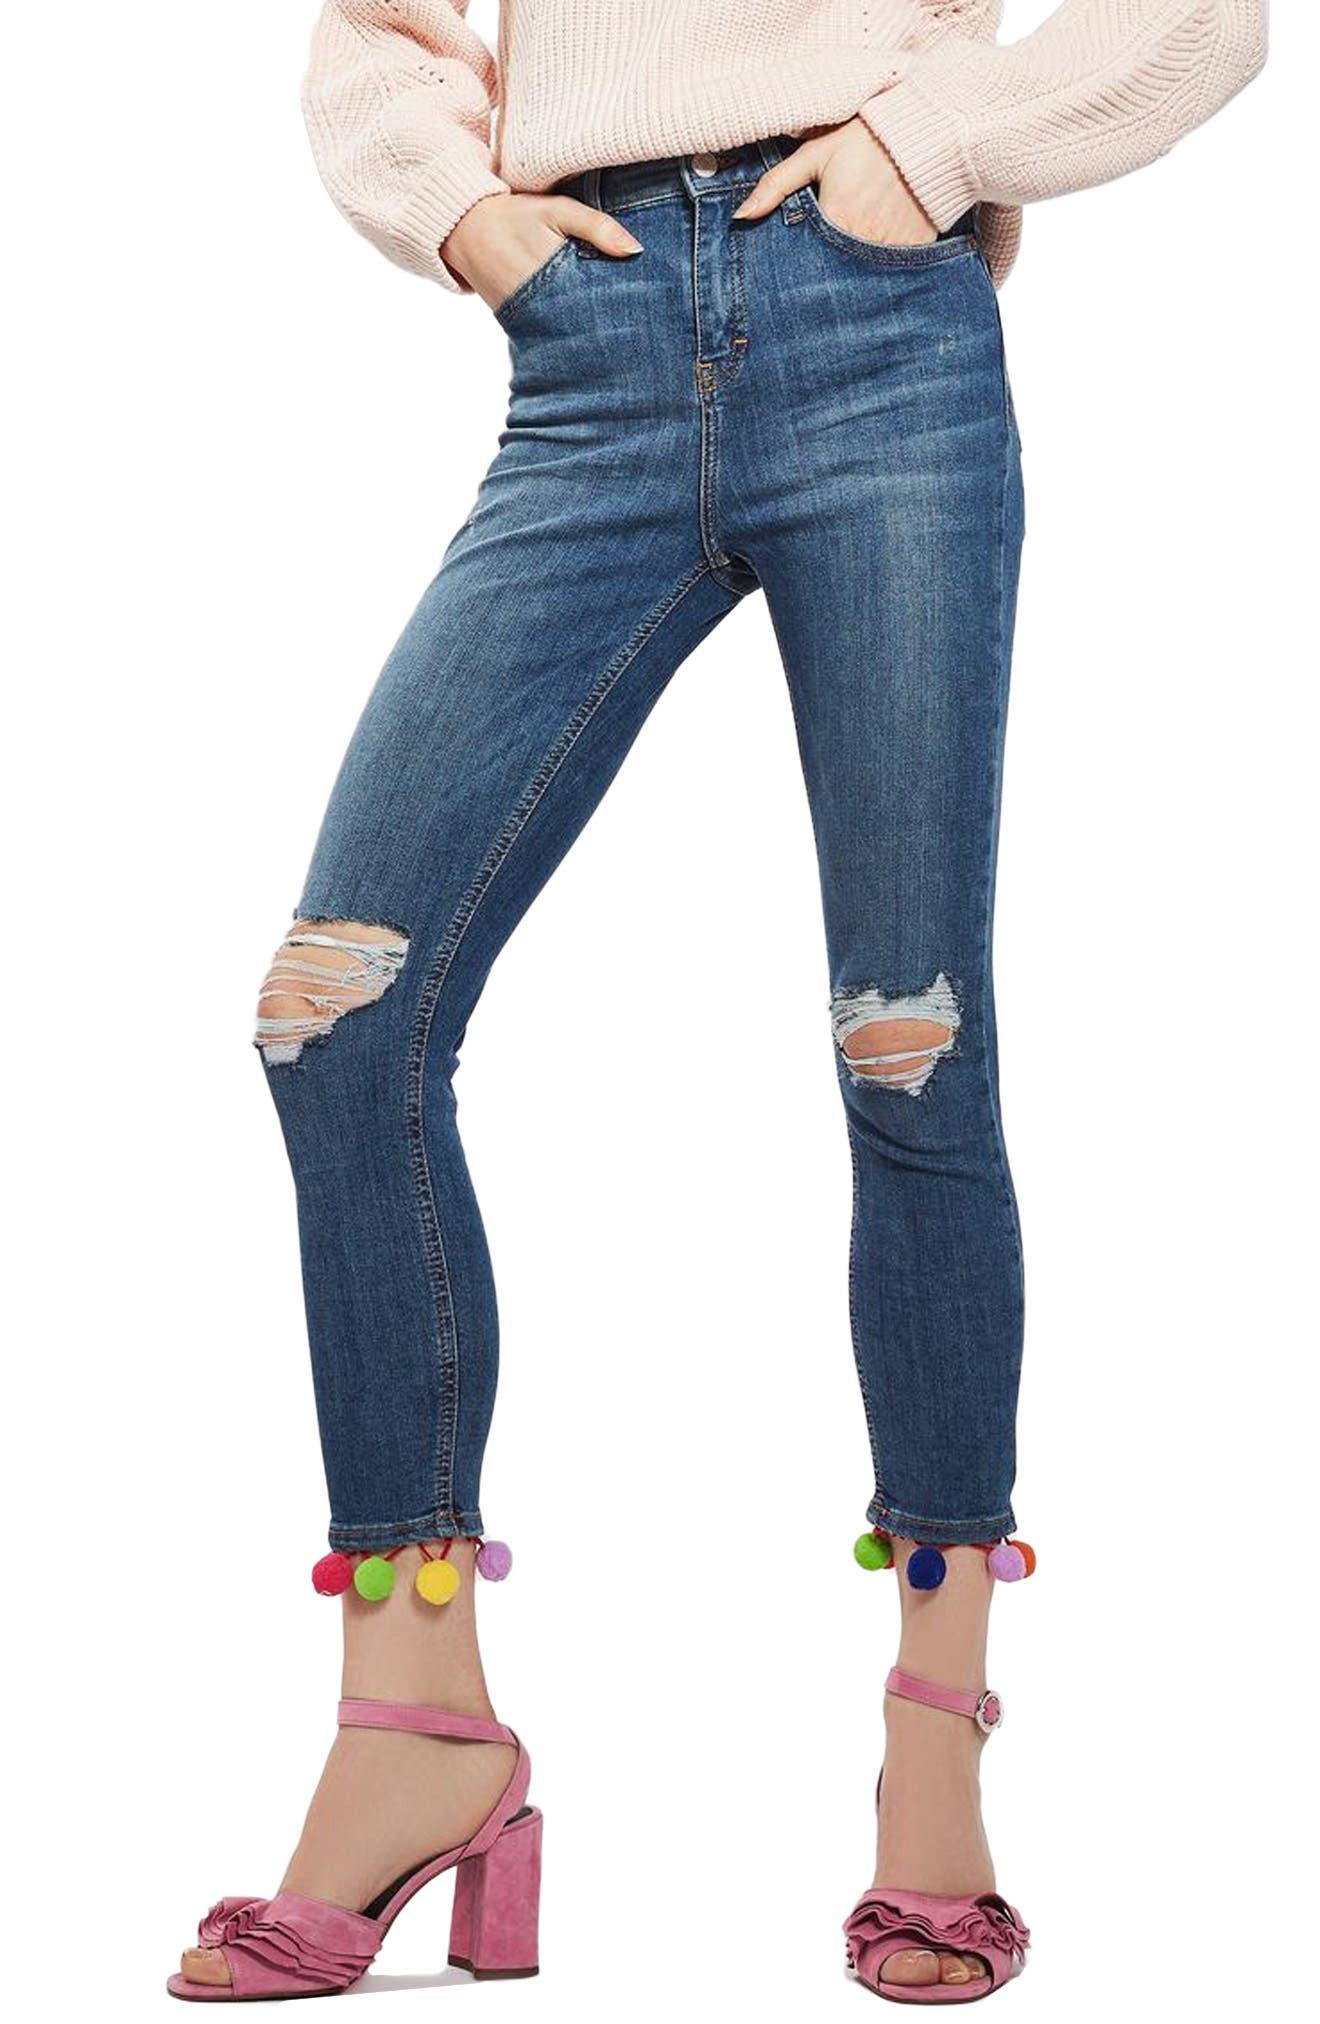 TOPSHOP, Jamie Pompom Skinny Jeans, Main thumbnail 1, color, 400